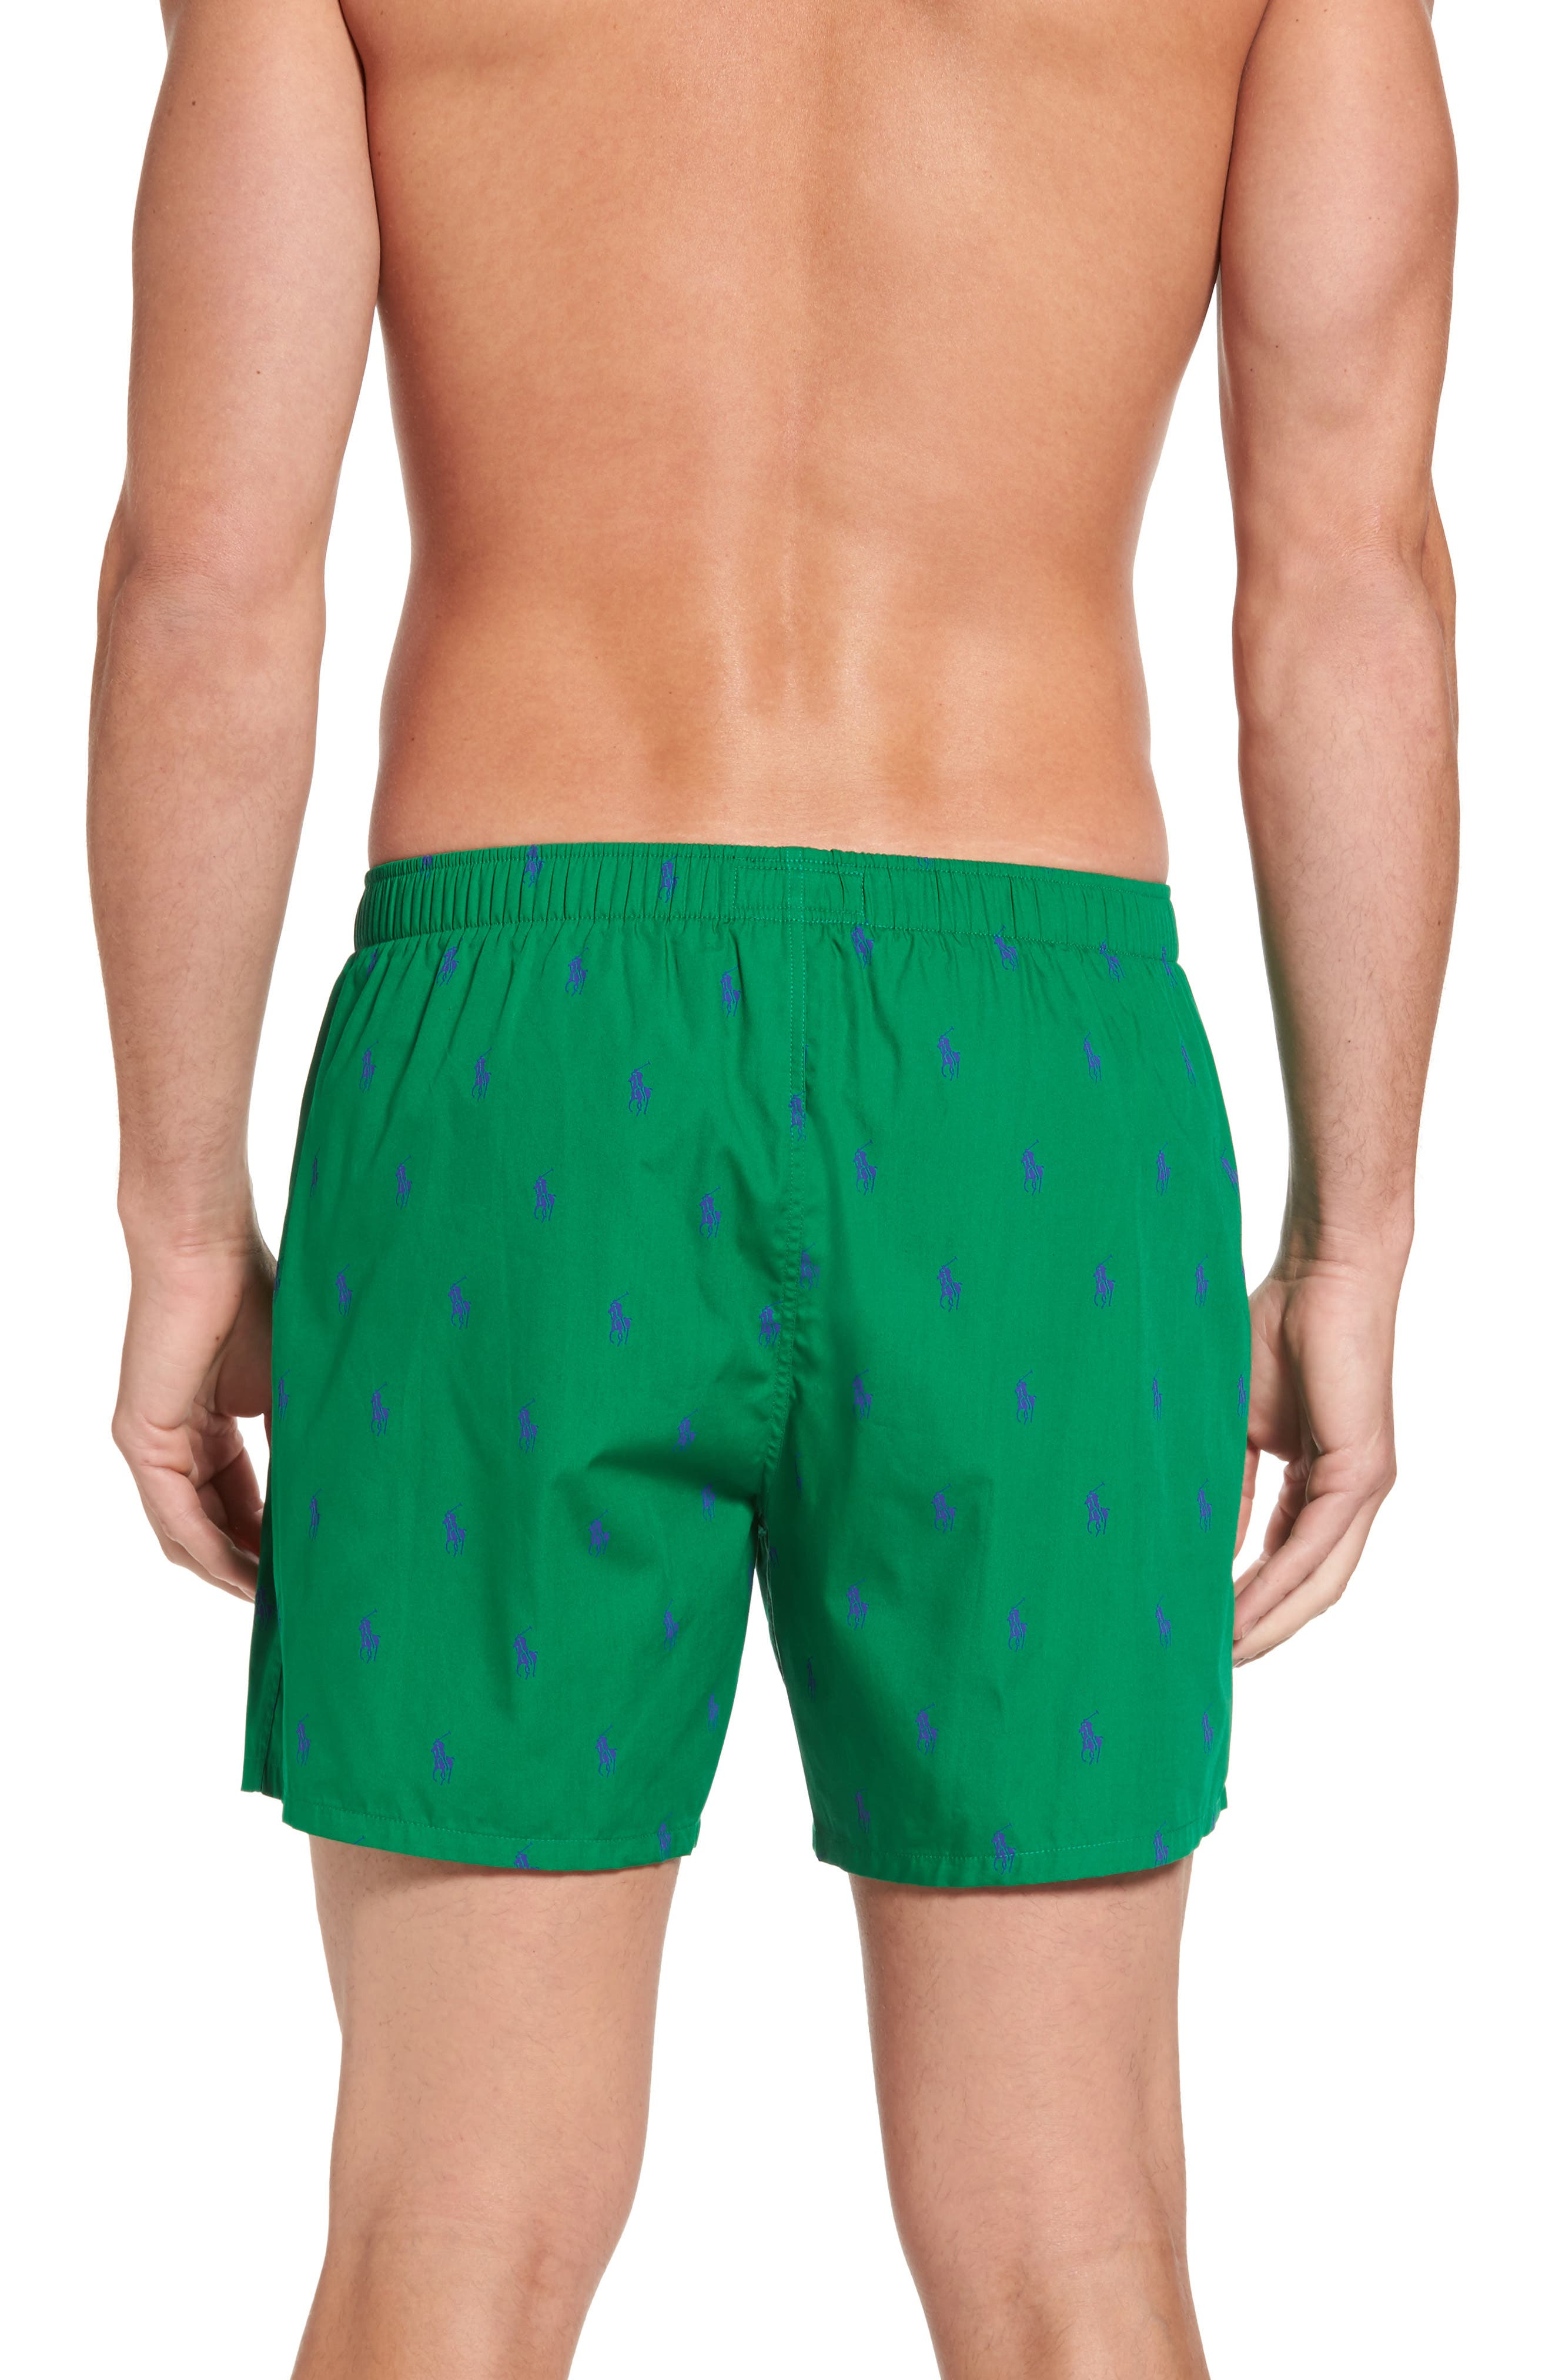 Pony Cotton Boxers,                             Alternate thumbnail 2, color,                             English Green